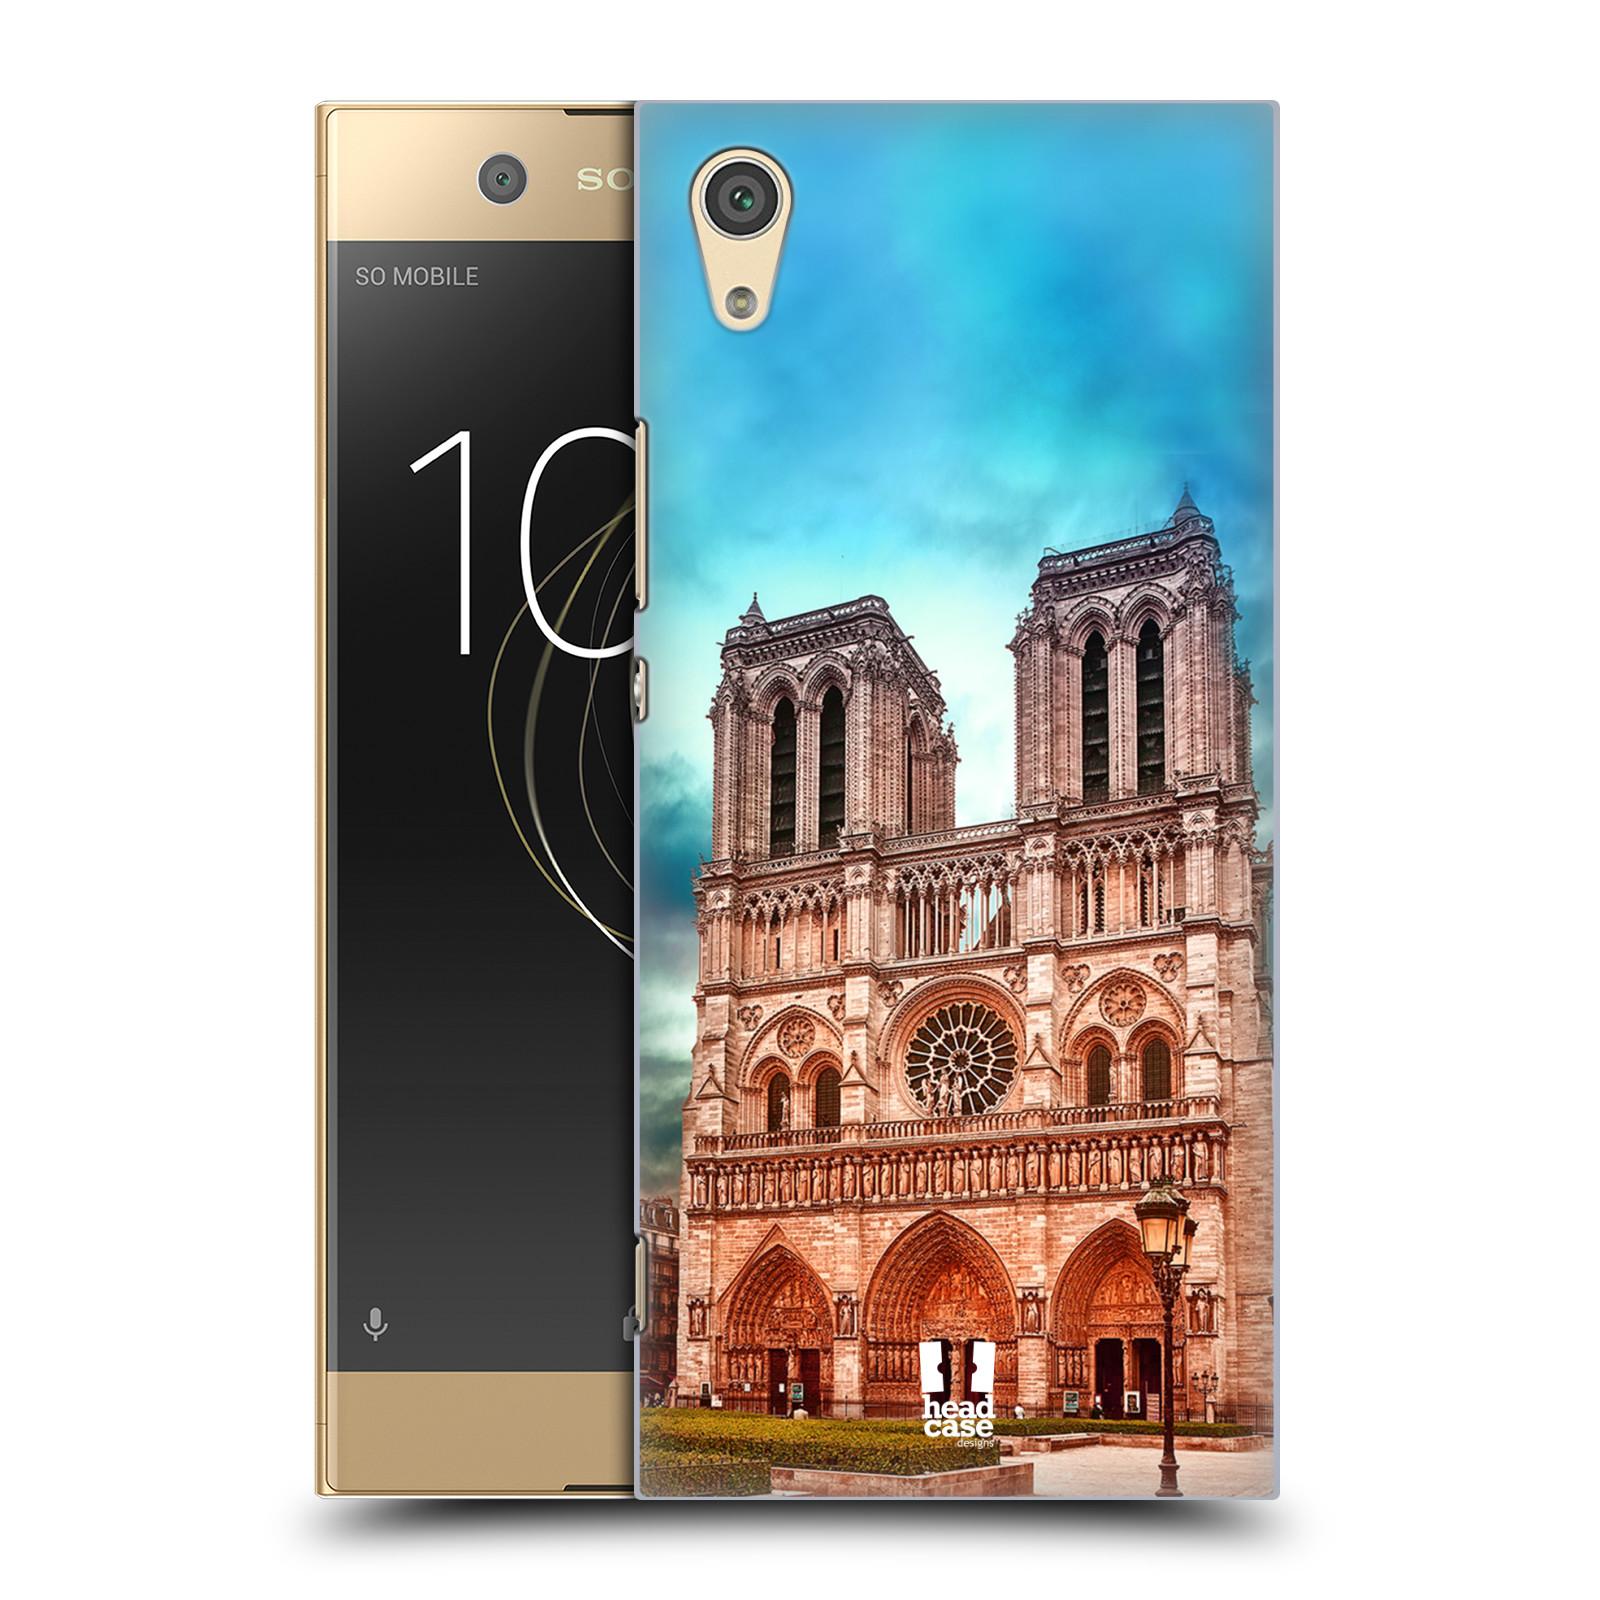 Pouzdro na mobil Sony Xperia XA1 - HEAD CASE - historická místa katedrála Notre Dame